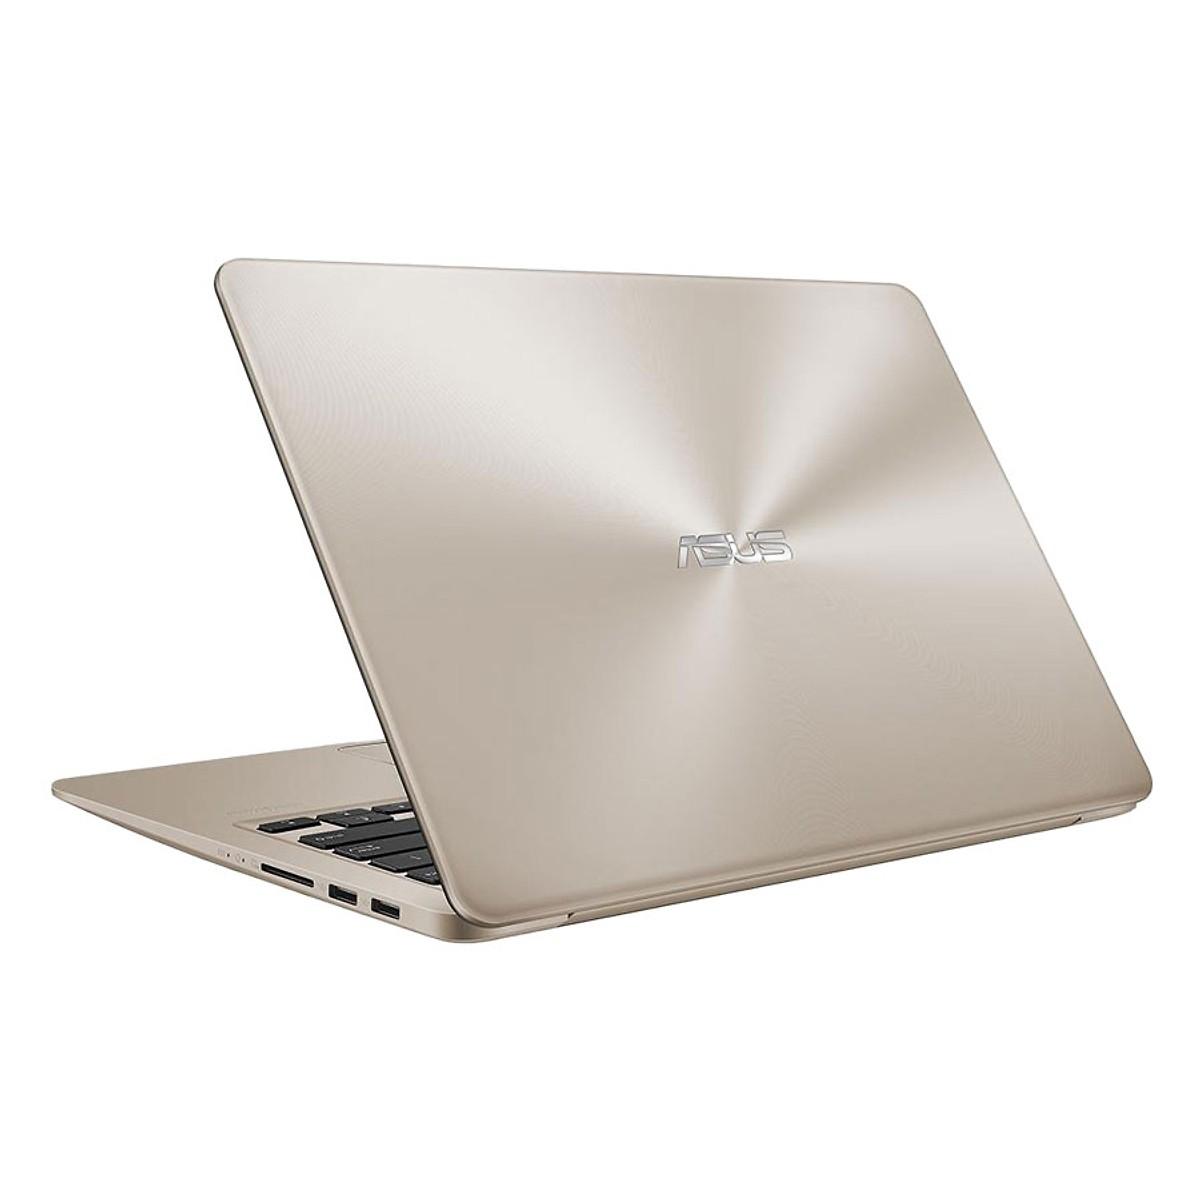 Laptop Asus Vivobook X411UA-BV221T Core i3-7100U/Win 10 (14 inch )